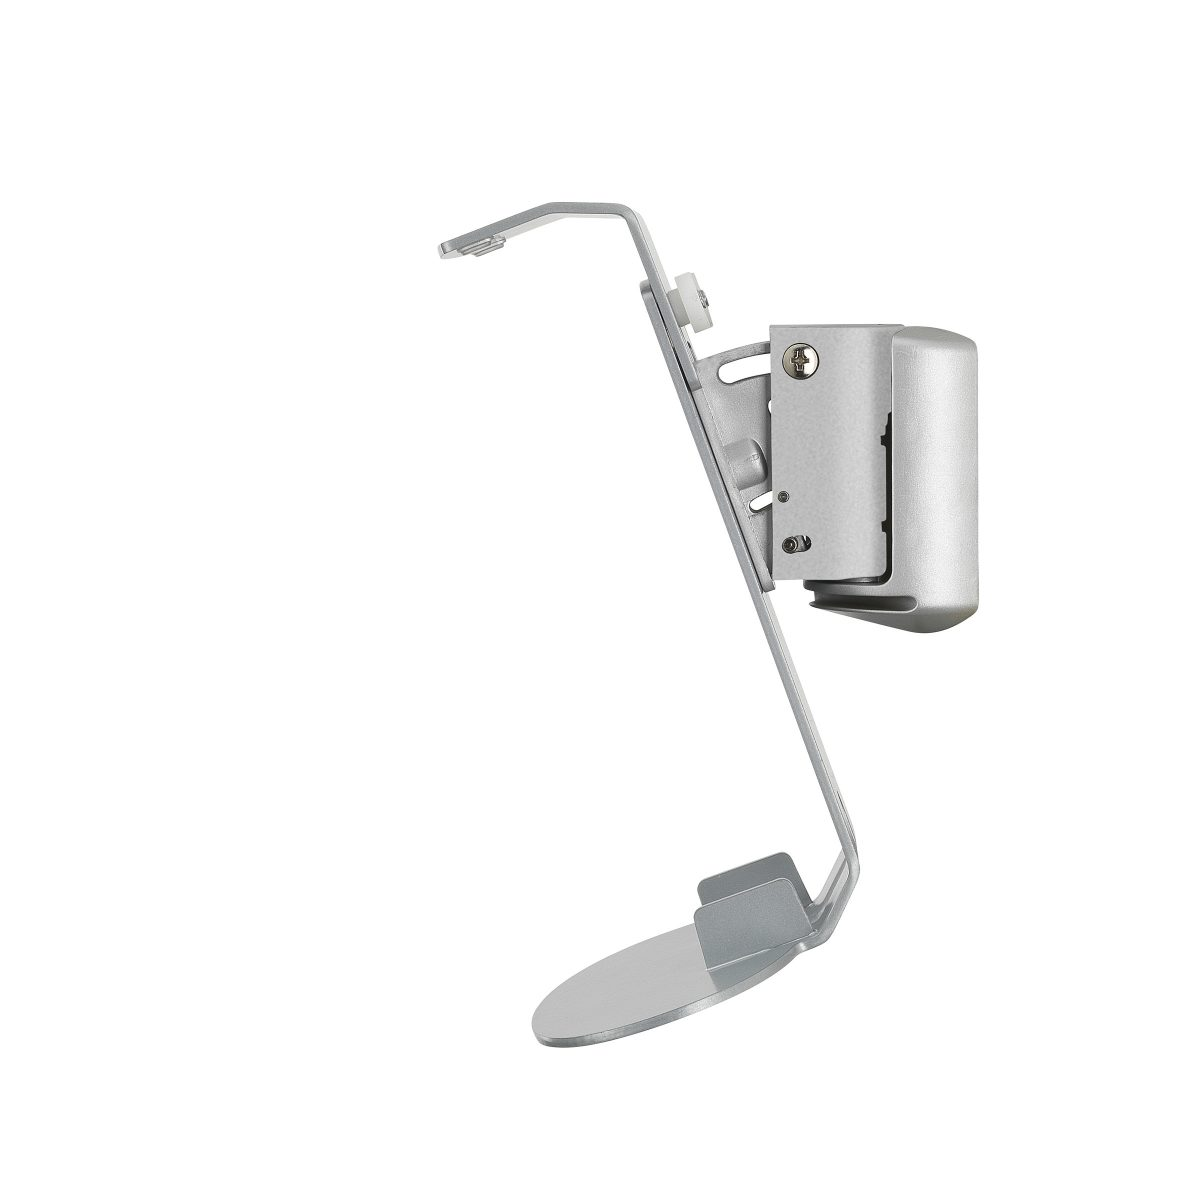 Bose Home Speaker 500 muurbeugel silver 2